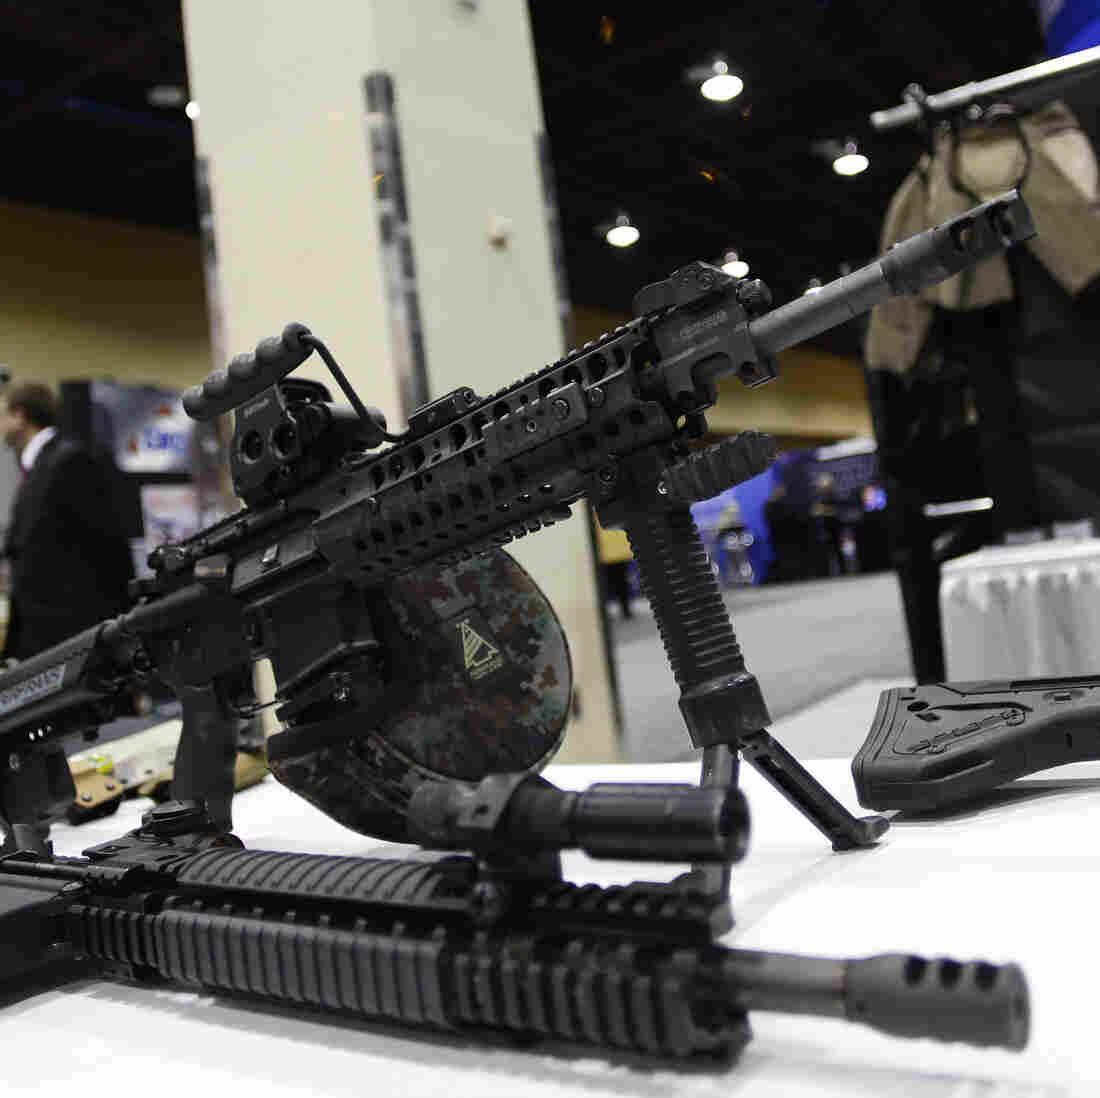 Blocked Or Breaking Through? Mixed Signals On Gun Bills